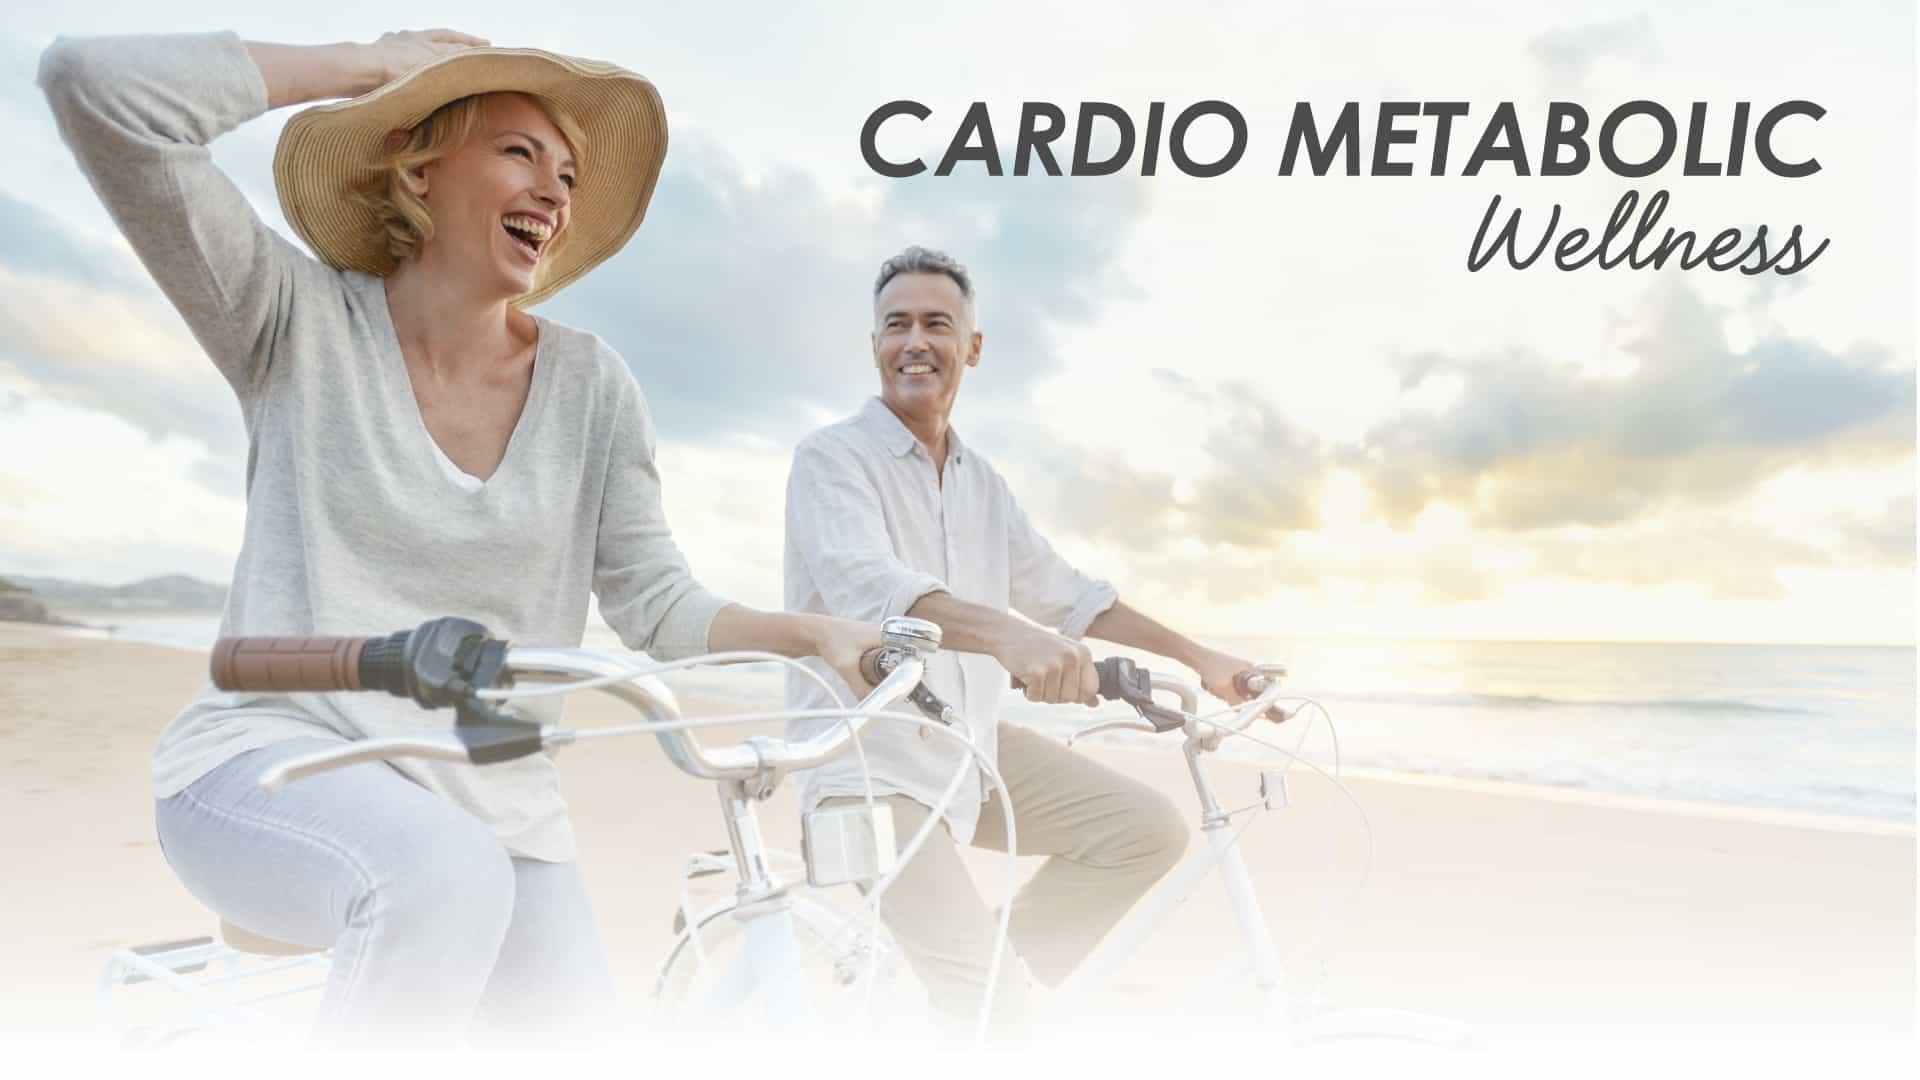 cardio metabolic